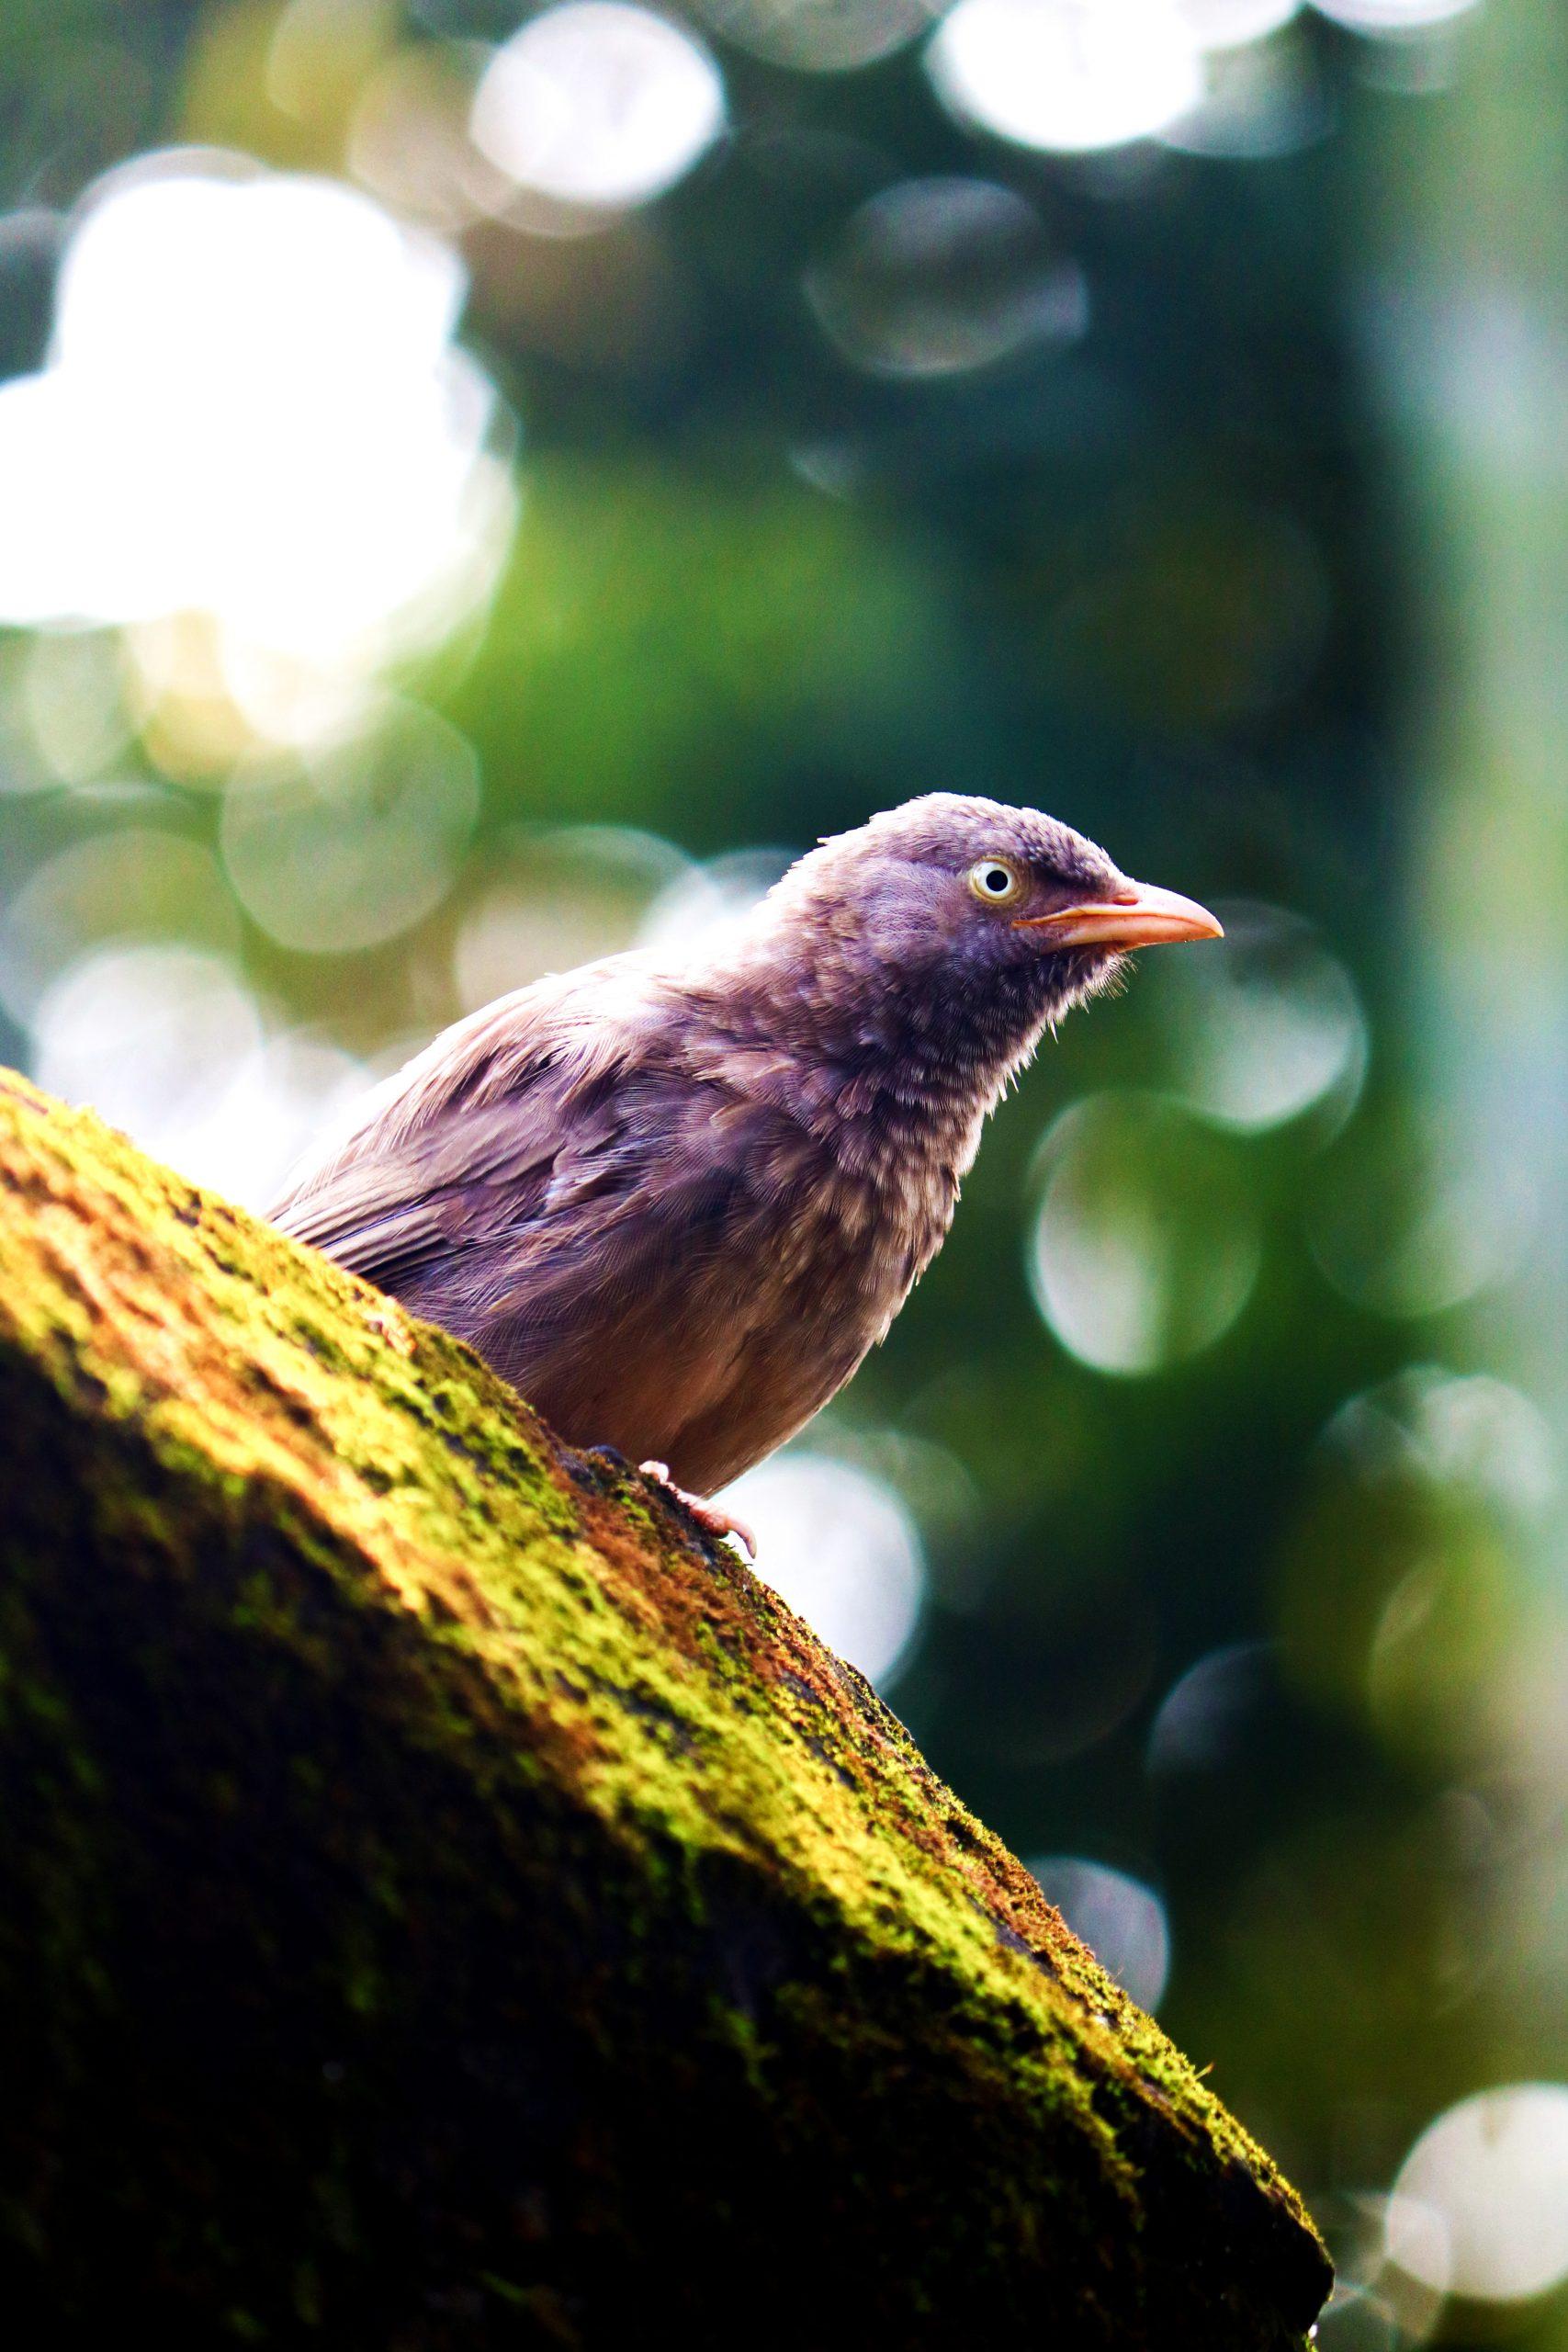 A sparrow sitting on a wall